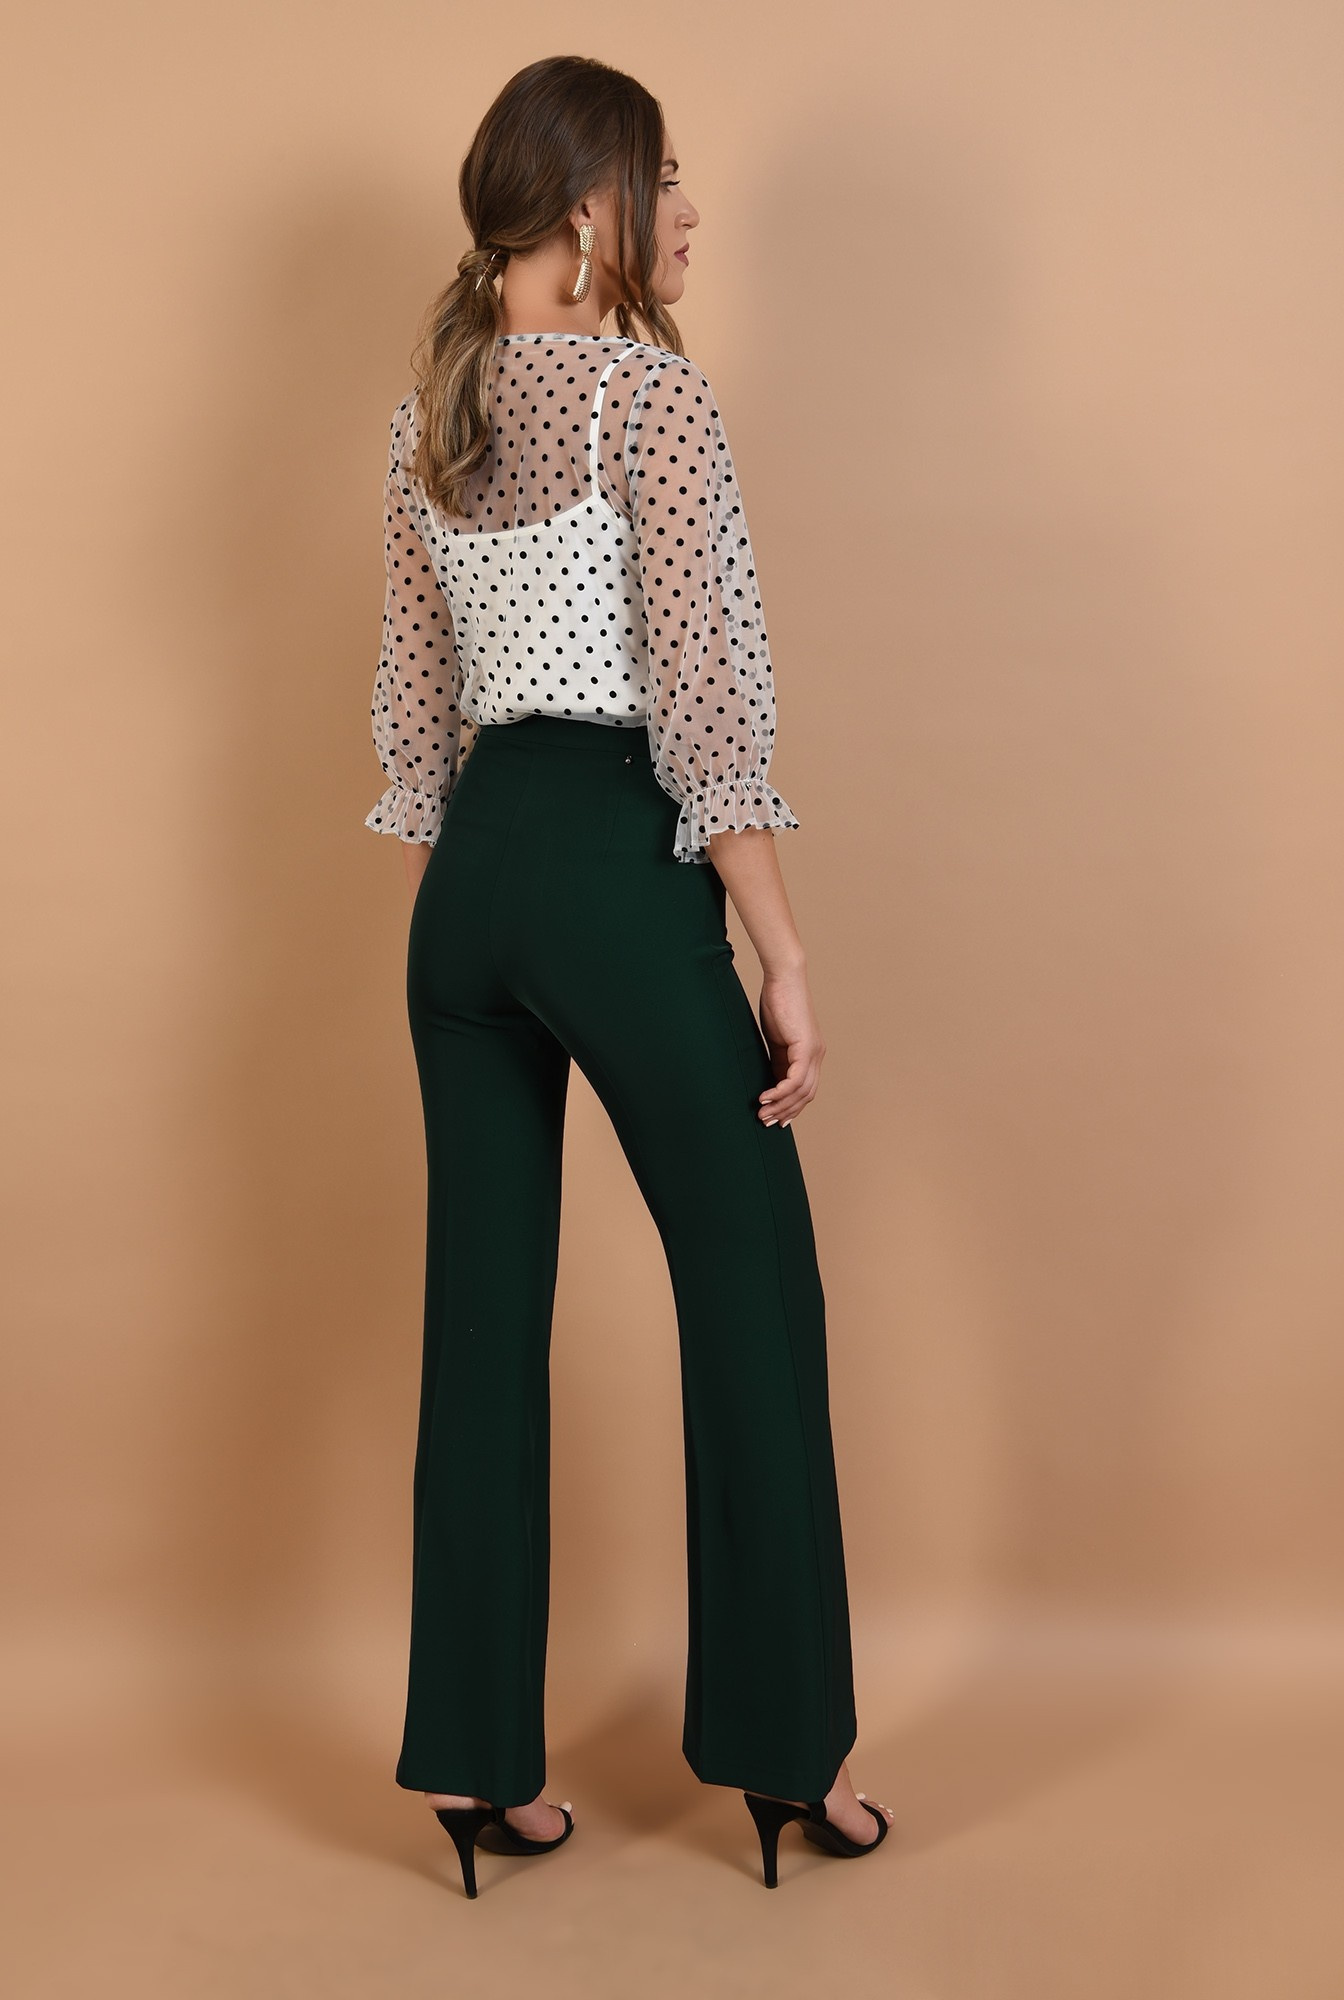 1 - 360 - pantaloni evazati, lungi, croi la dunga, verde inchis, Poema